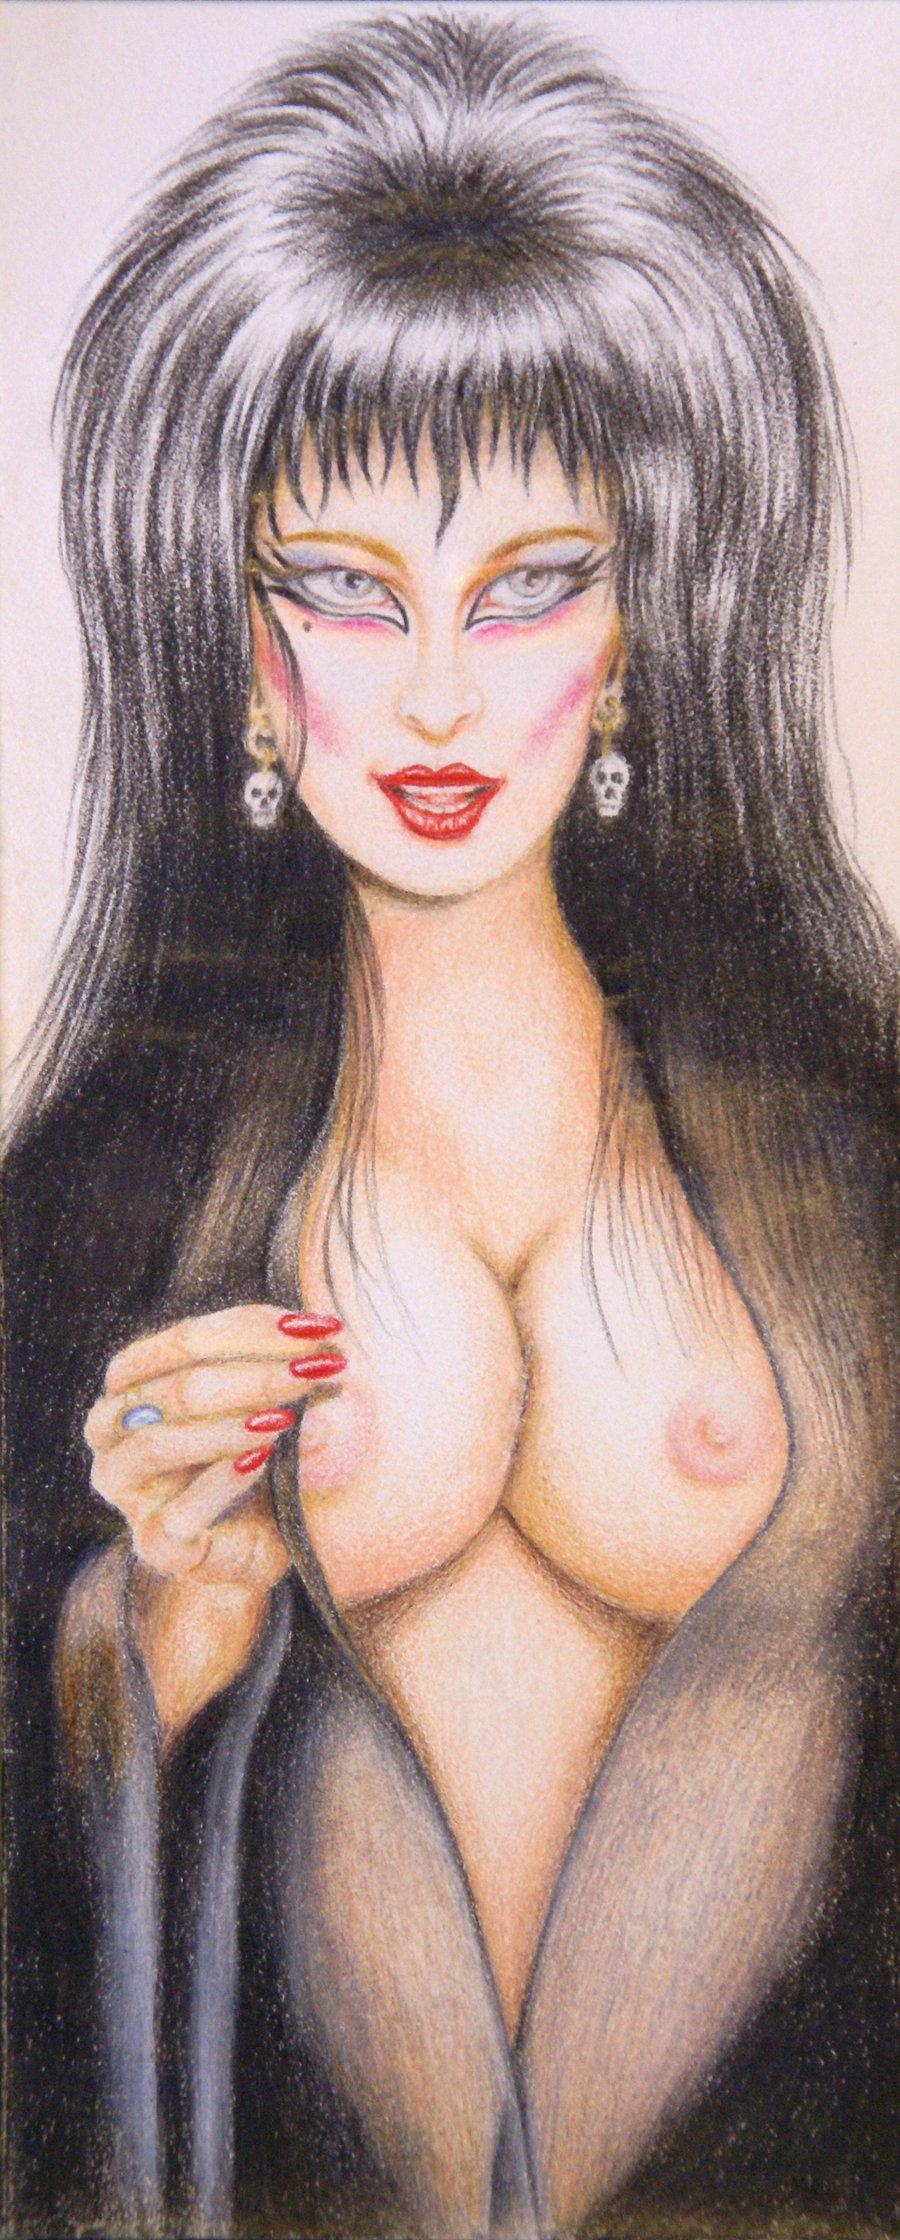 of dark tits mistress elvira the Black rock shooter